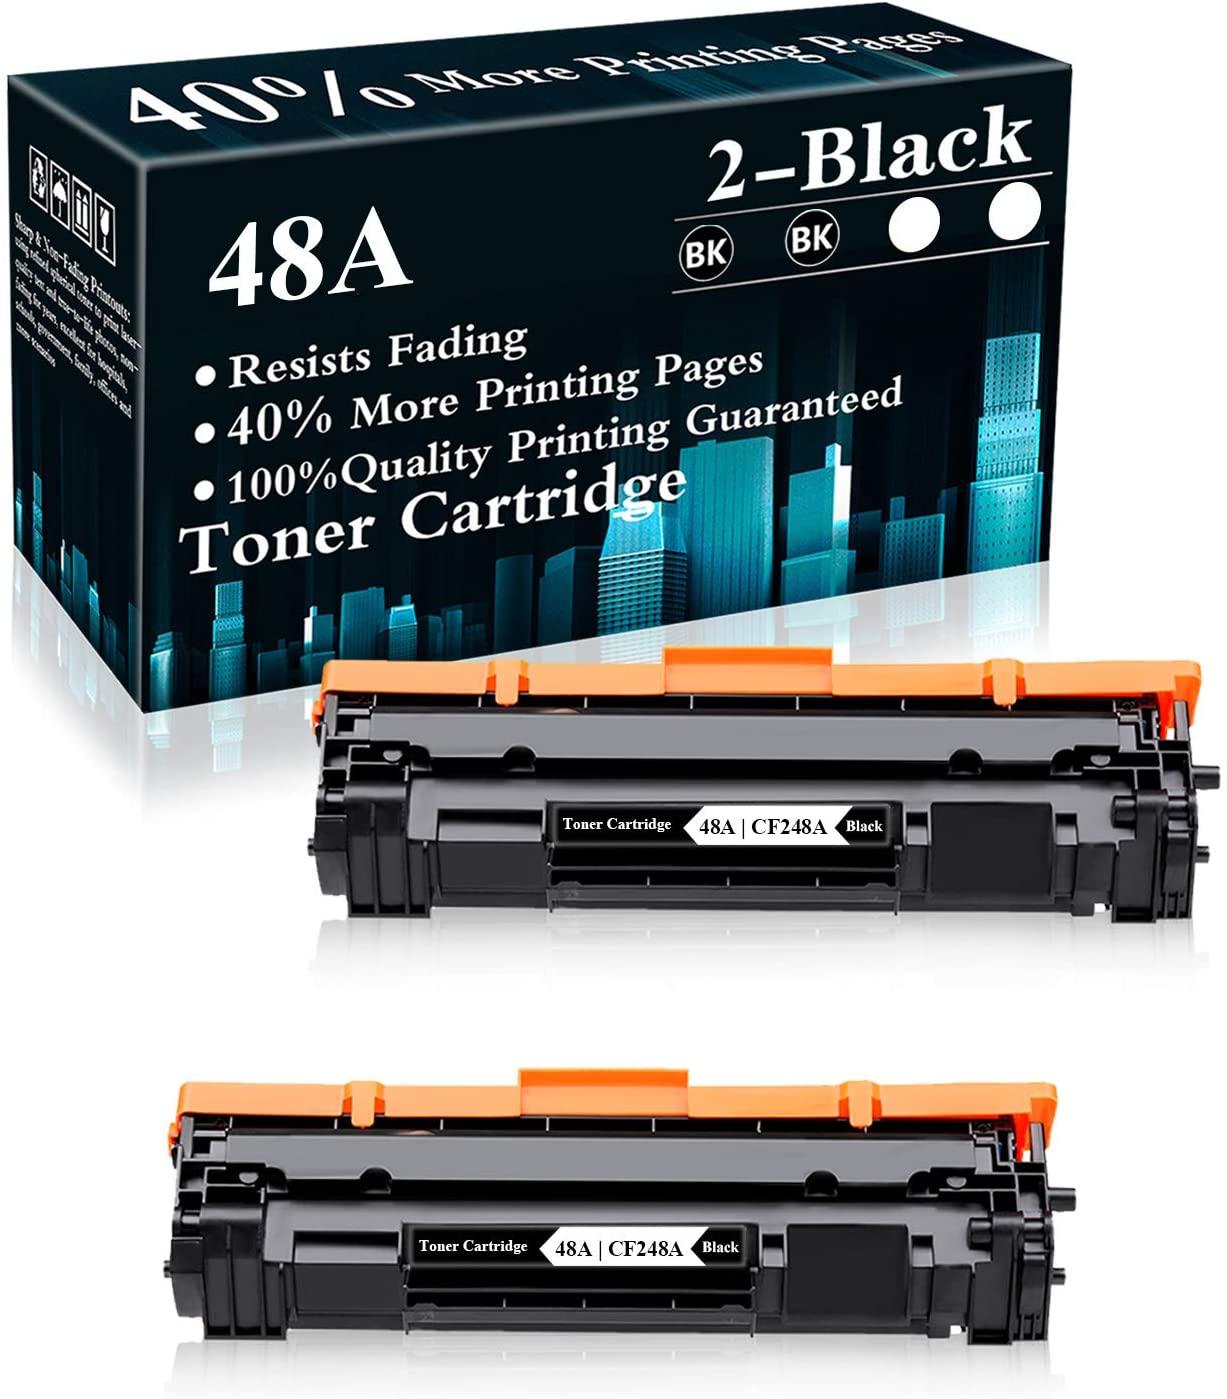 2 Pack 48A   CF248A Black Compatible Toner Cartridge Replacement for HP Laserjet Pro M15a M15w MFP M28a MFP M28w MFP M29w MFP M30w MFP M31w Printer,Sold by TopInk